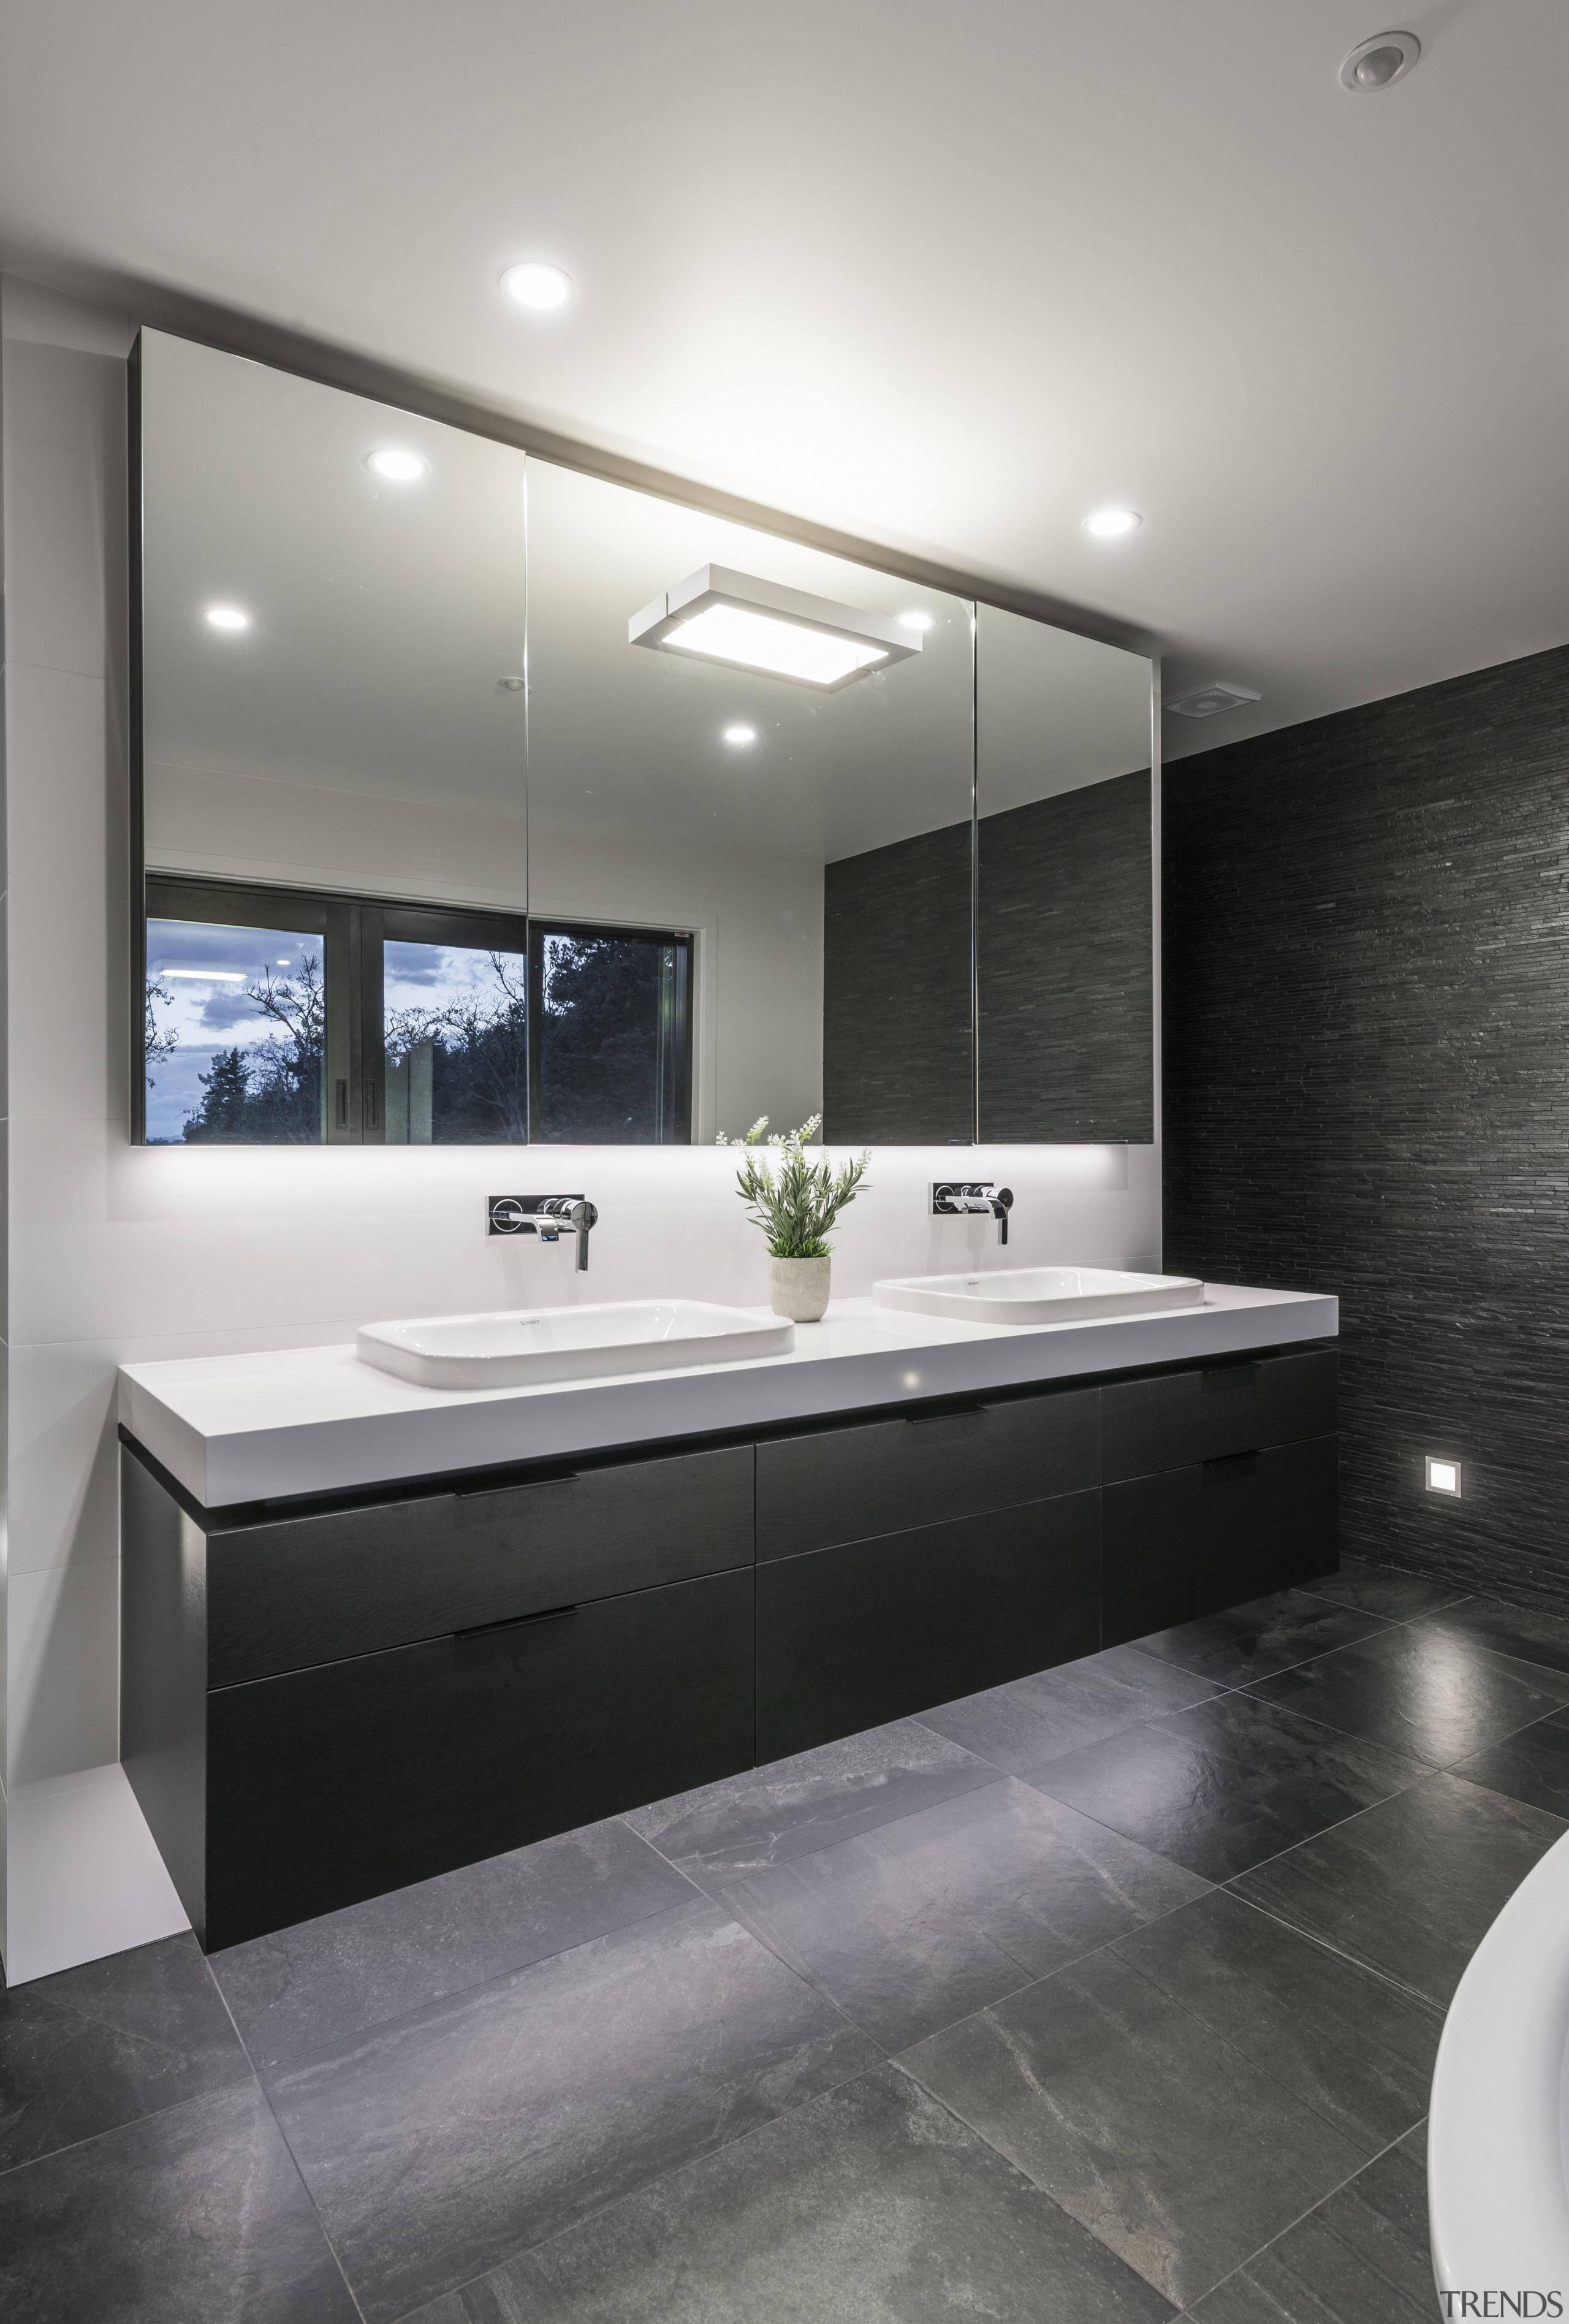 Under-vanity lighting highlights the stone-look flooring in this architecture, bathroom, ceiling, countertop, floor, interior design, product design, room, sink, gray, black